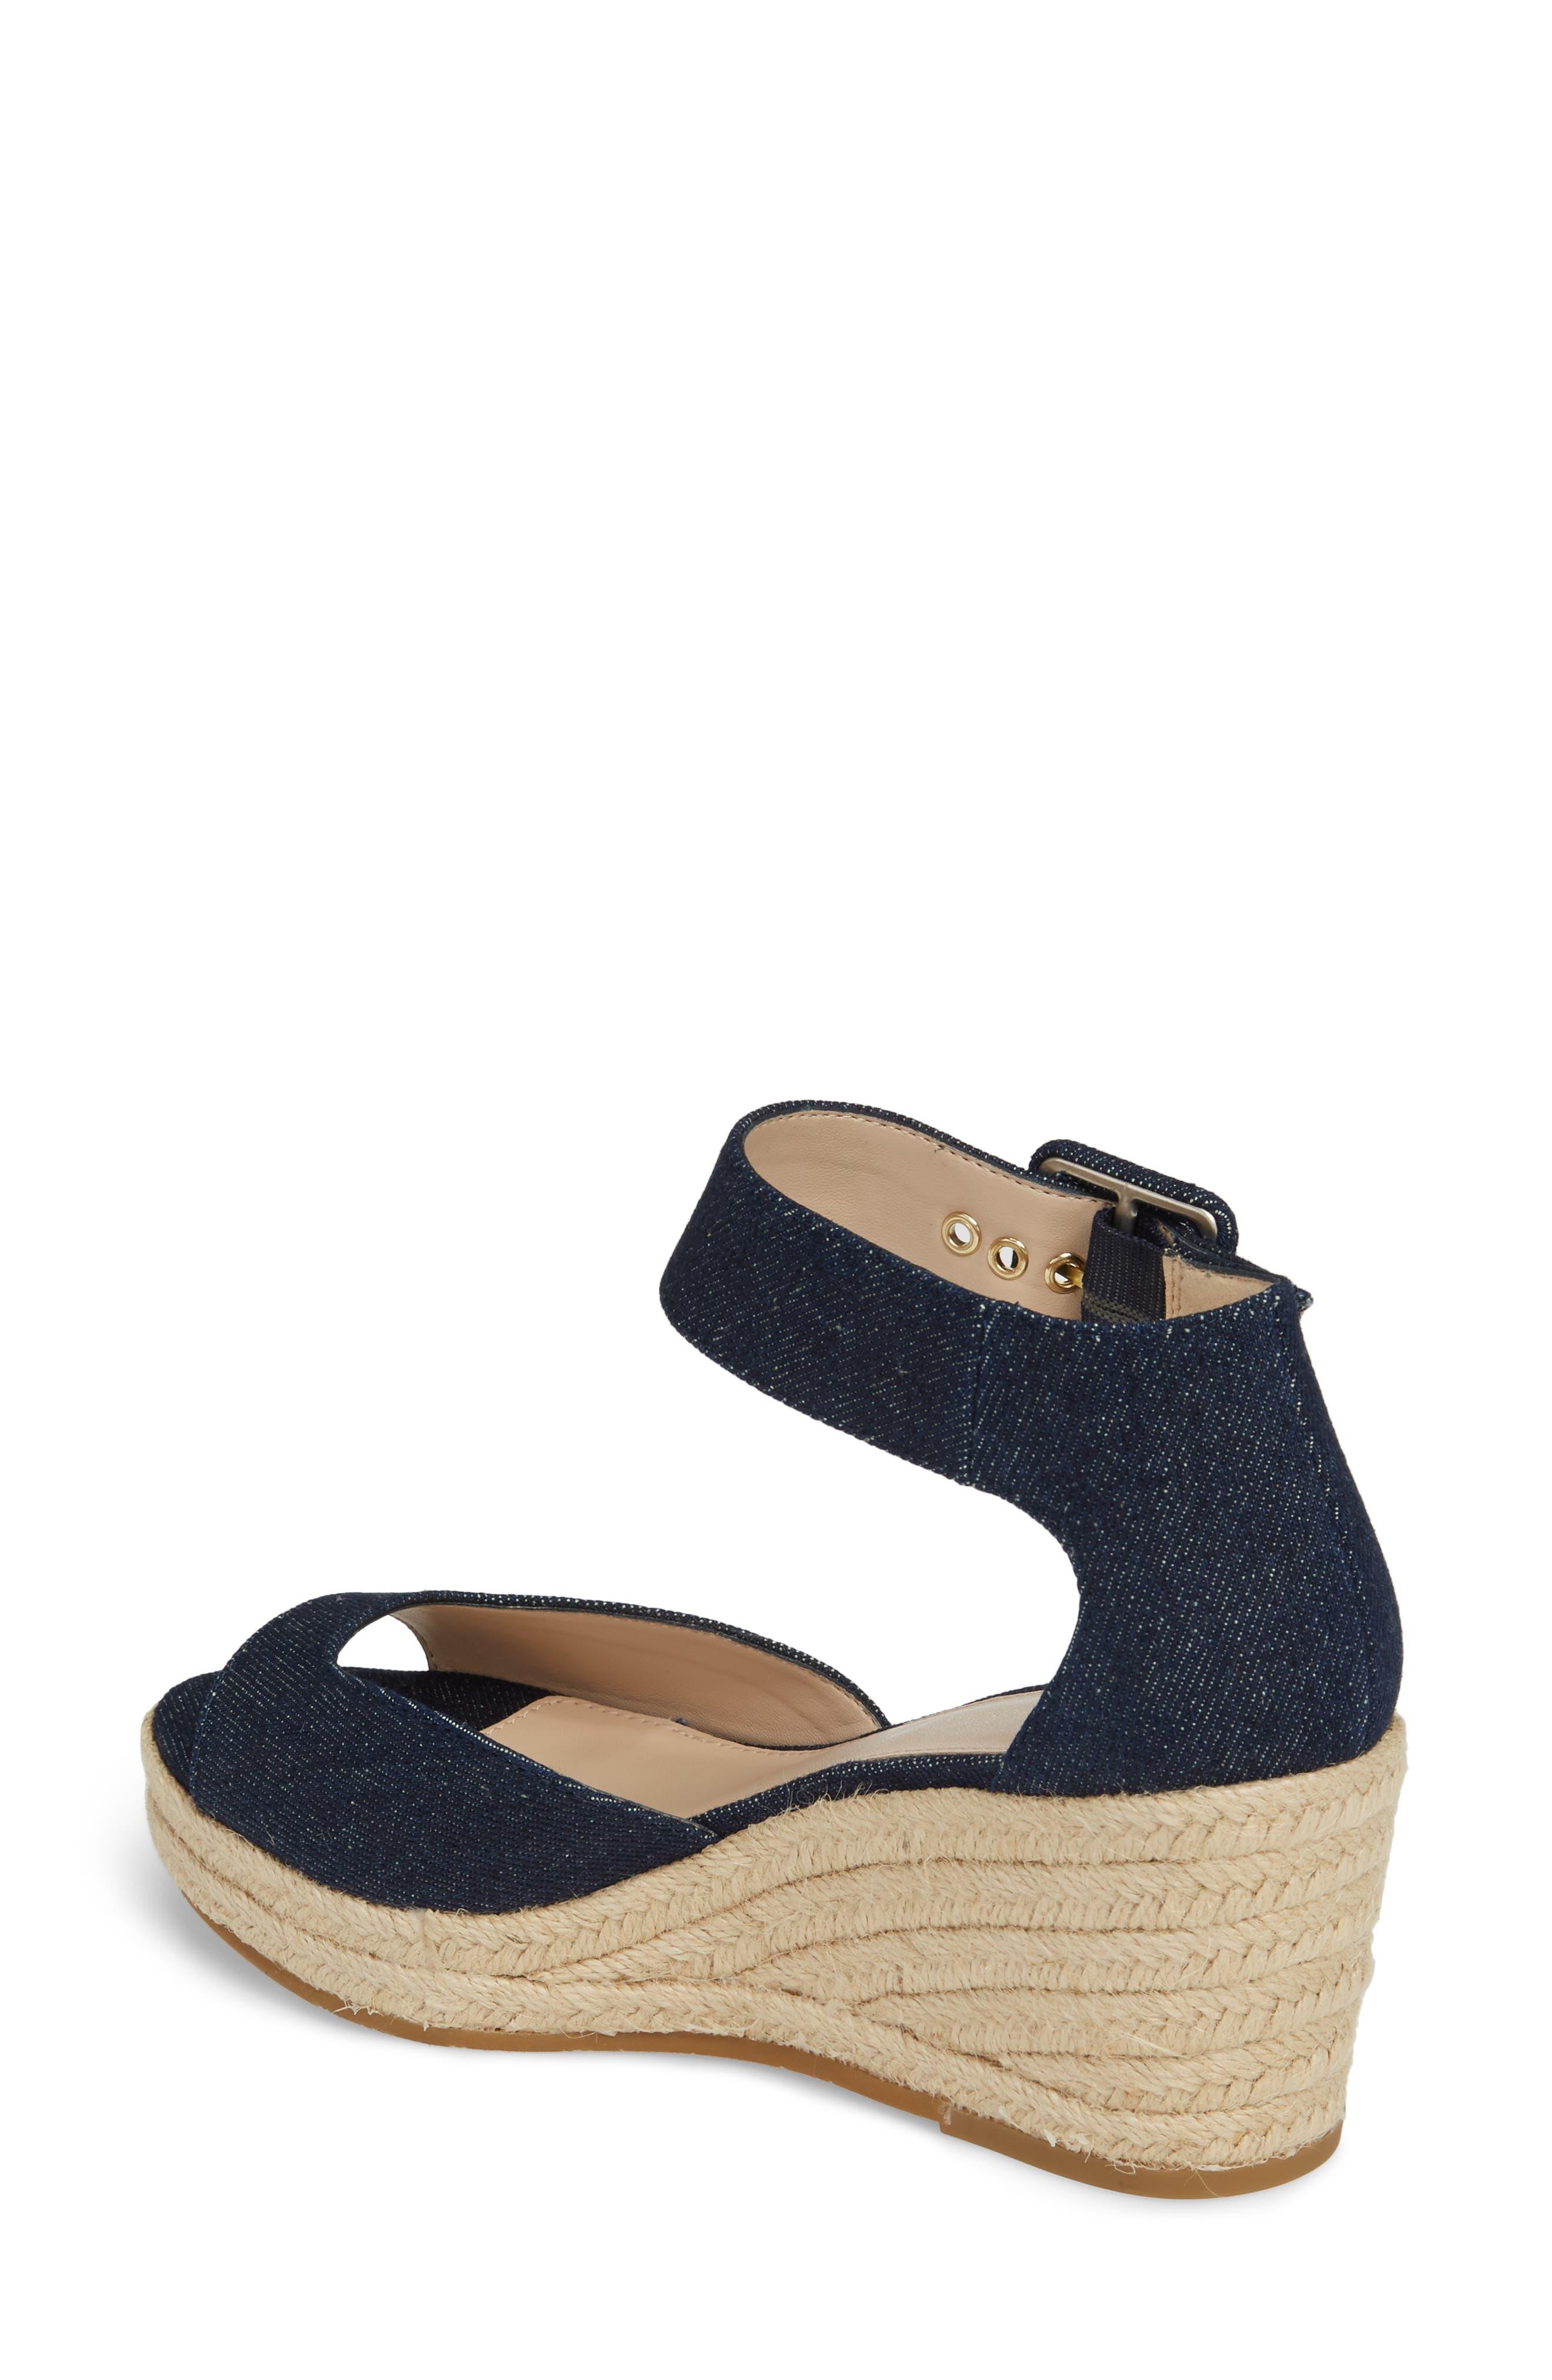 Alternate Image 2  - Pelle Moda Kauai Platform Wedge Sandal (Women)